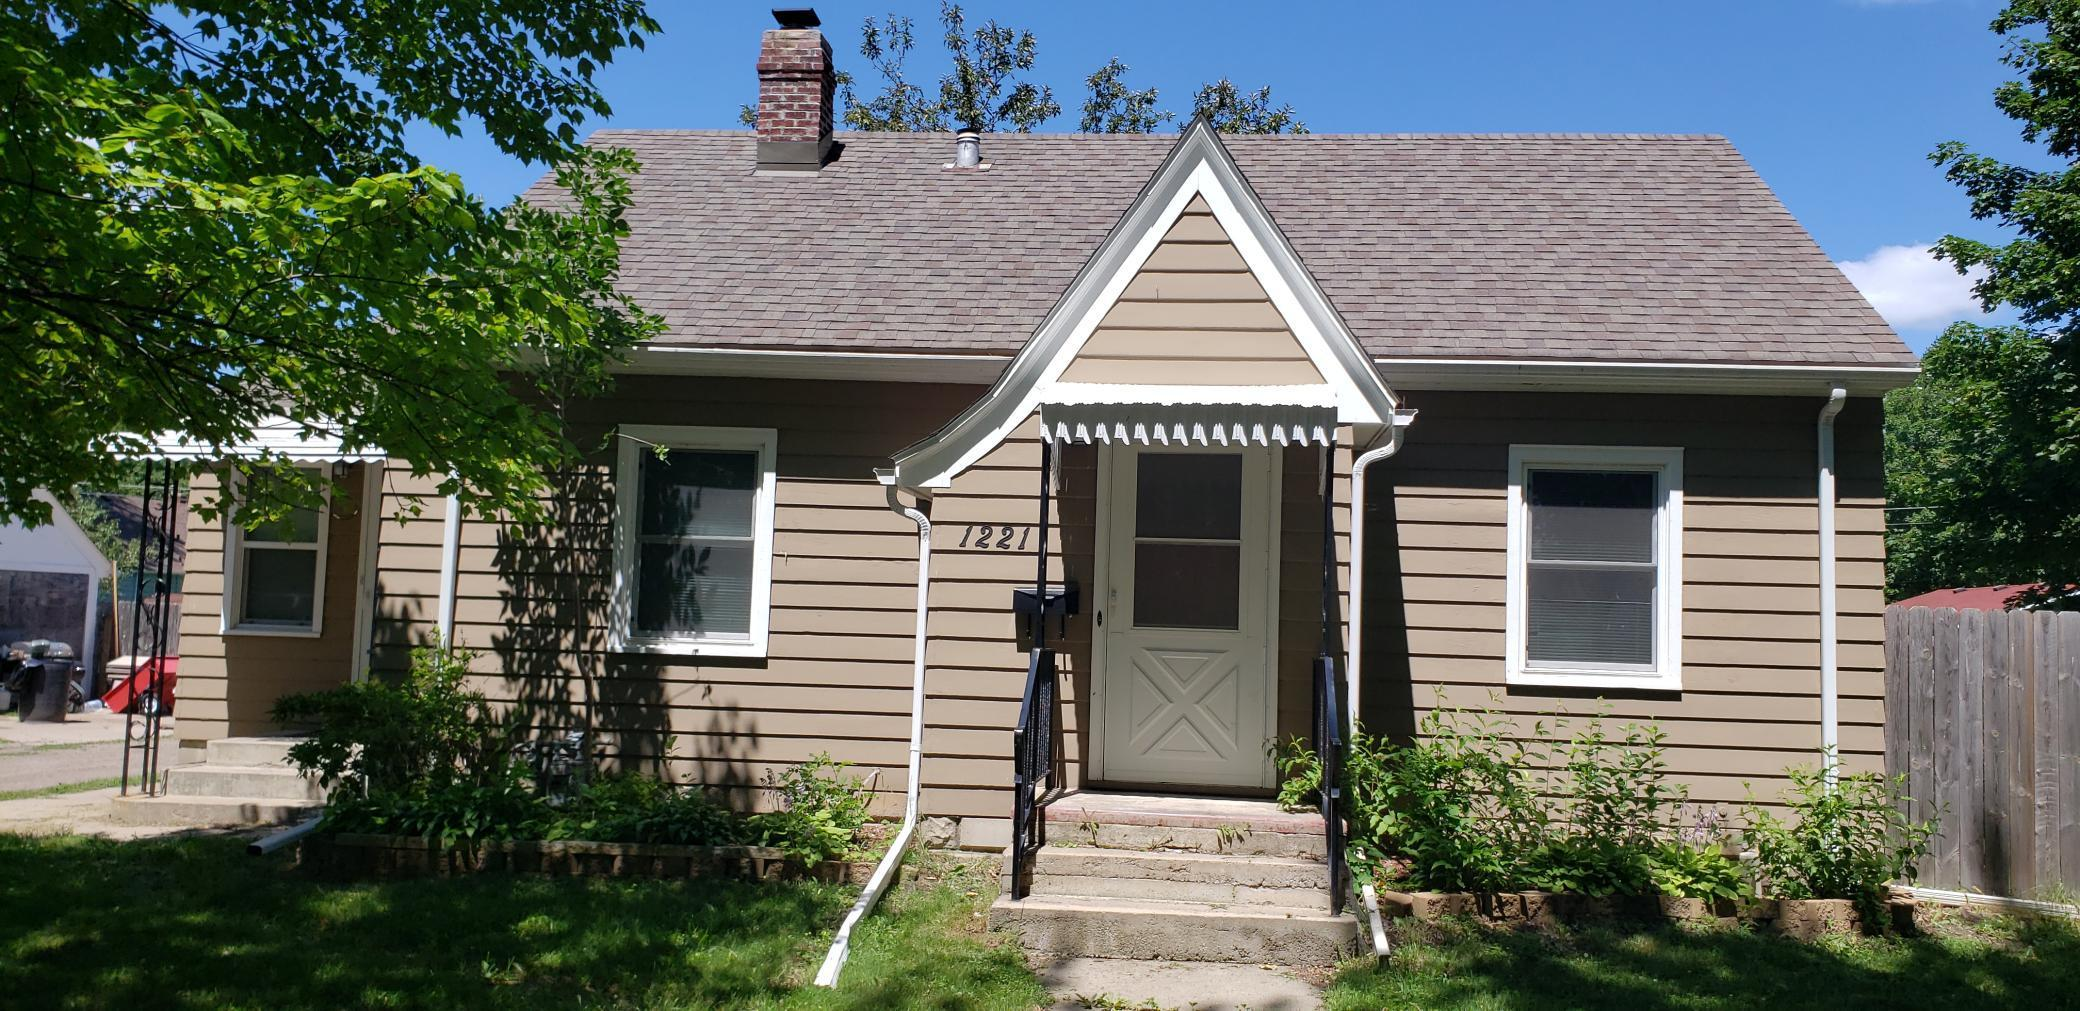 1221 13th E Property Photo - Glencoe, MN real estate listing